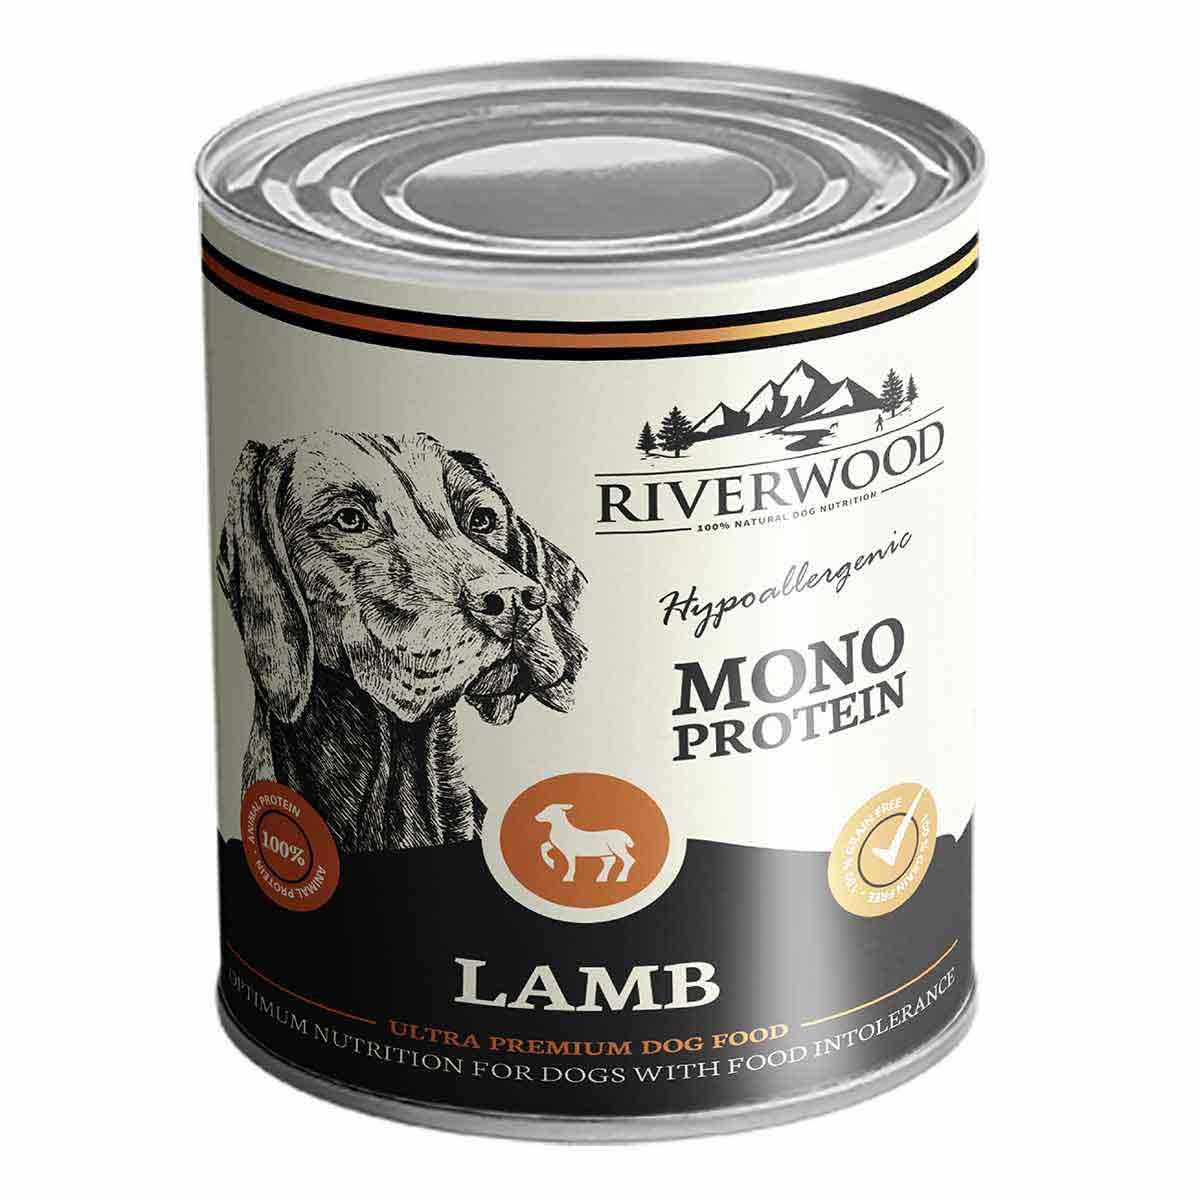 Mono Proteïne Lamb